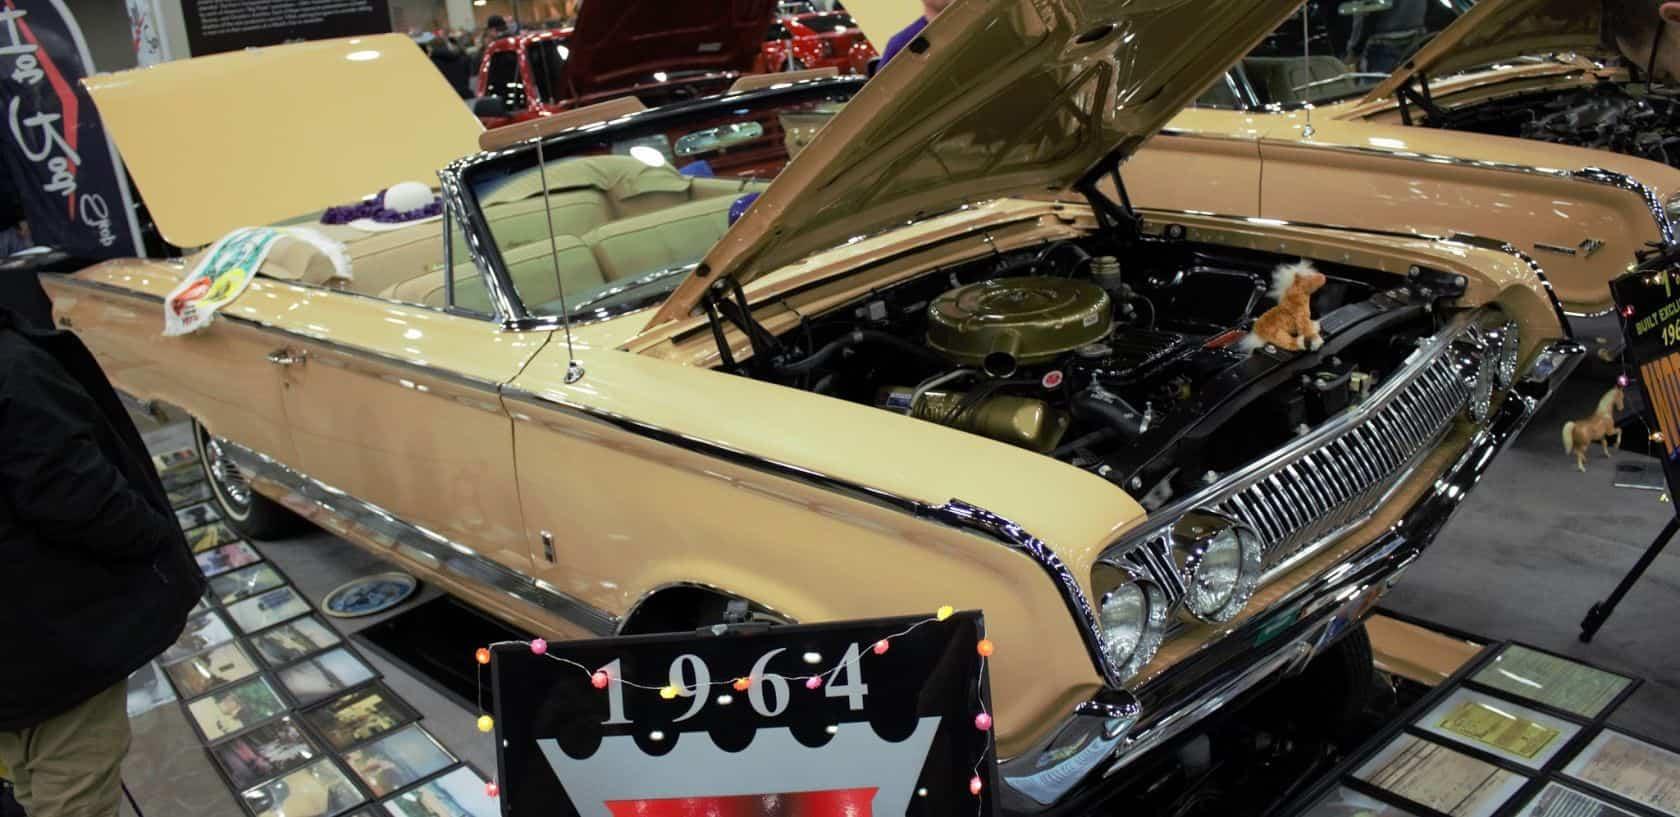 1964 mercury parklane convertible